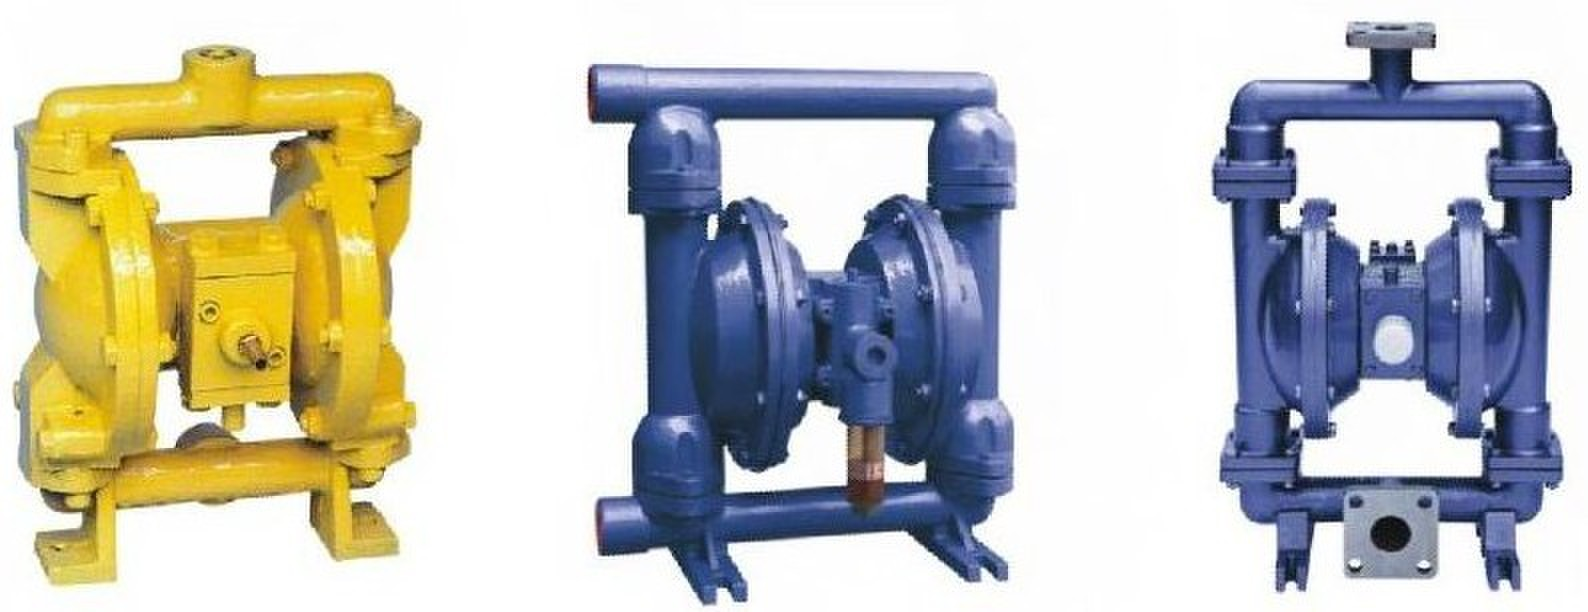 QBY型气动隔膜泵说明书